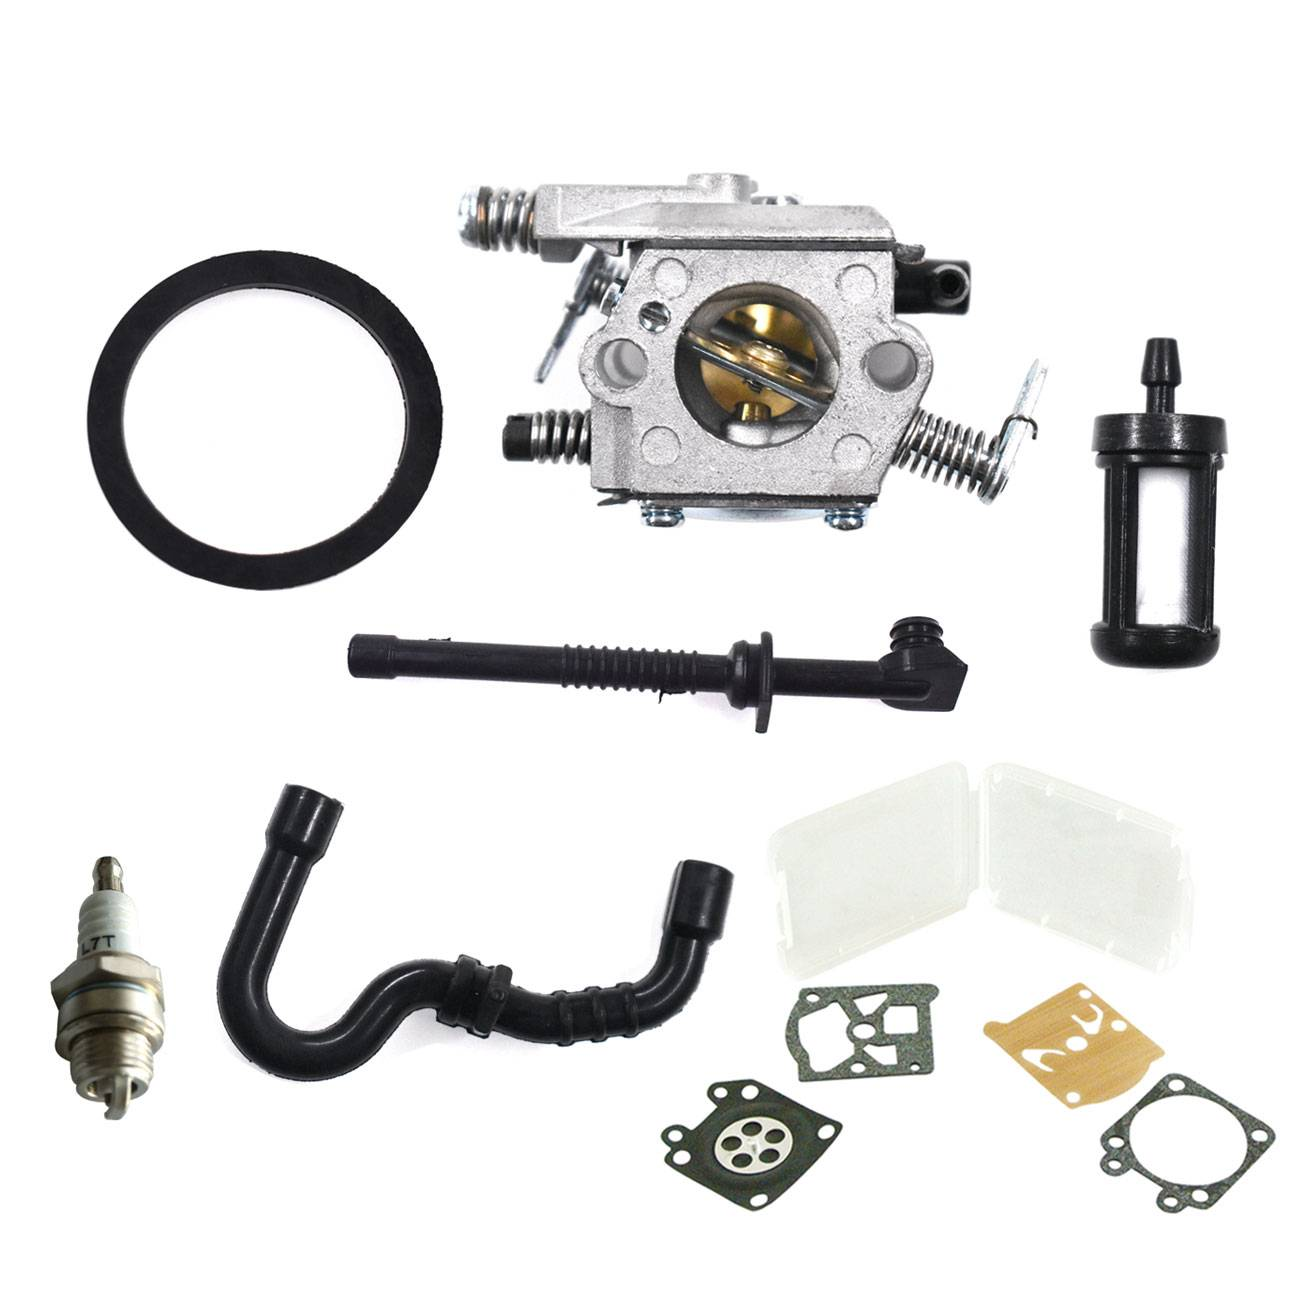 Low Price Carburetor Spark Plug for STIHL 017 018 MS170